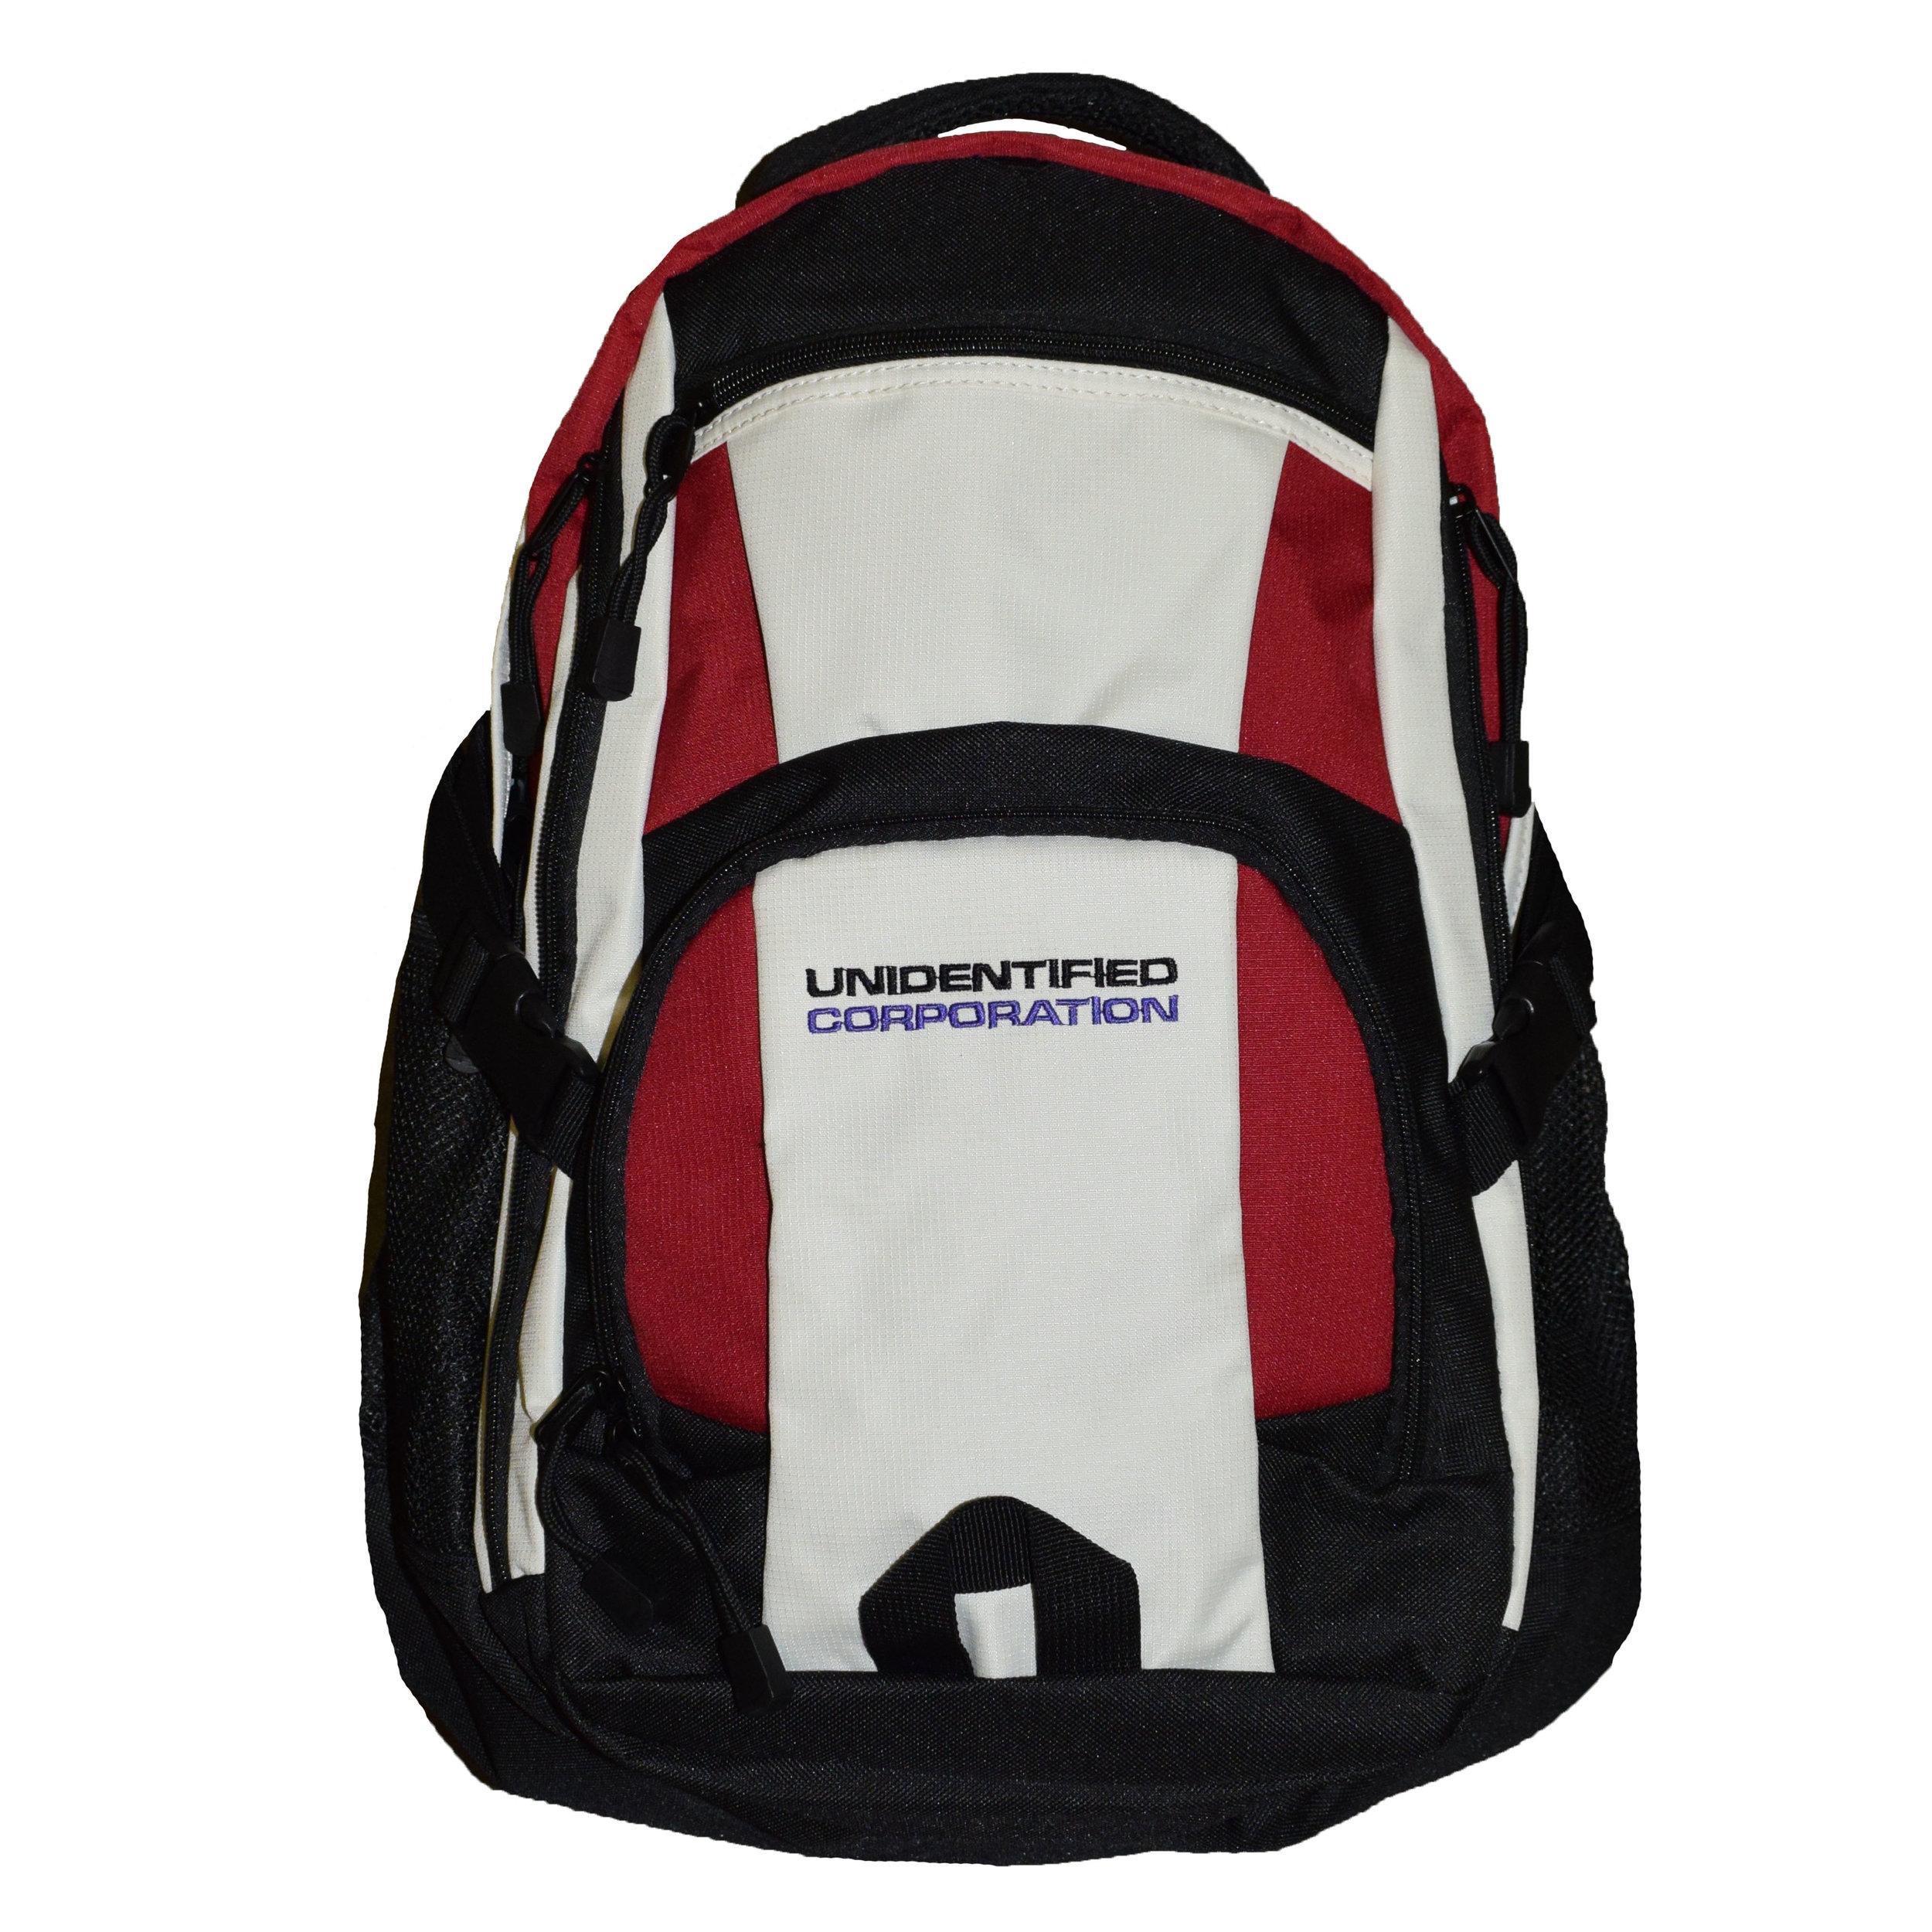 Backpack Red Square.jpg